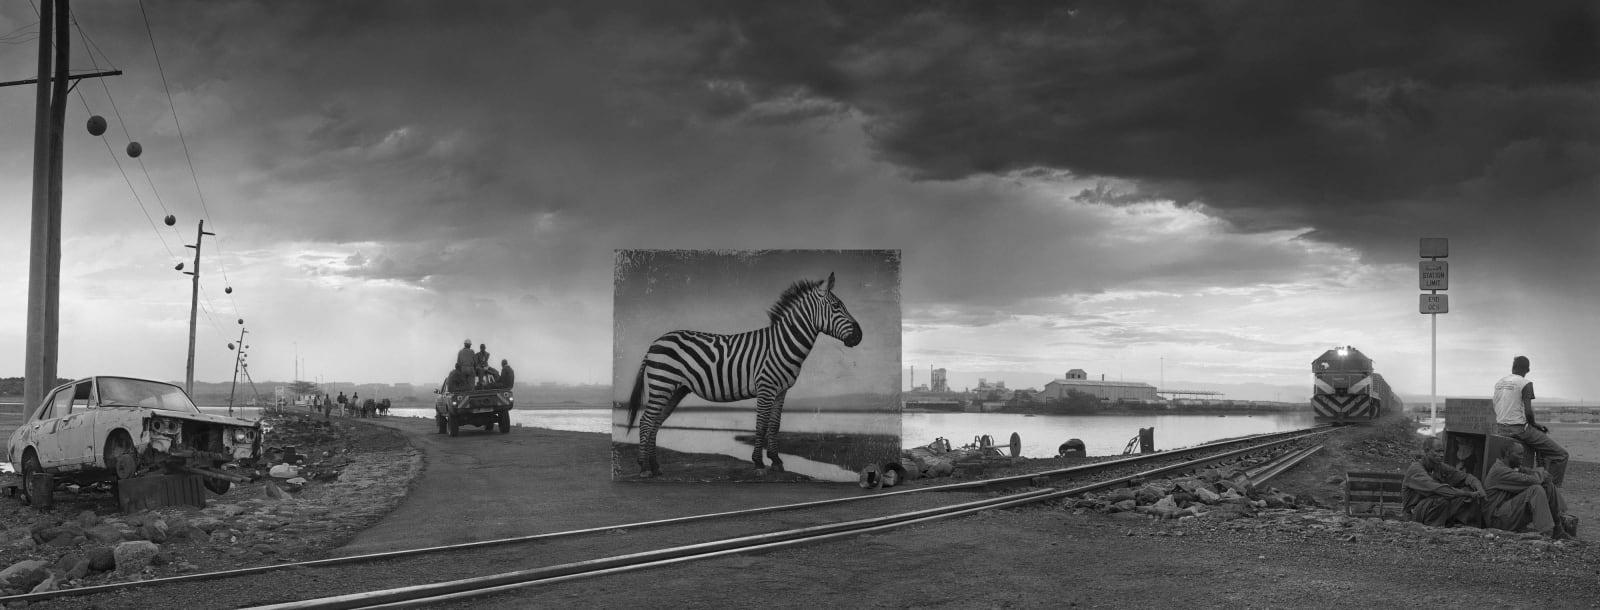 Nick Brandt, Road to Factory with Zebra, 2014